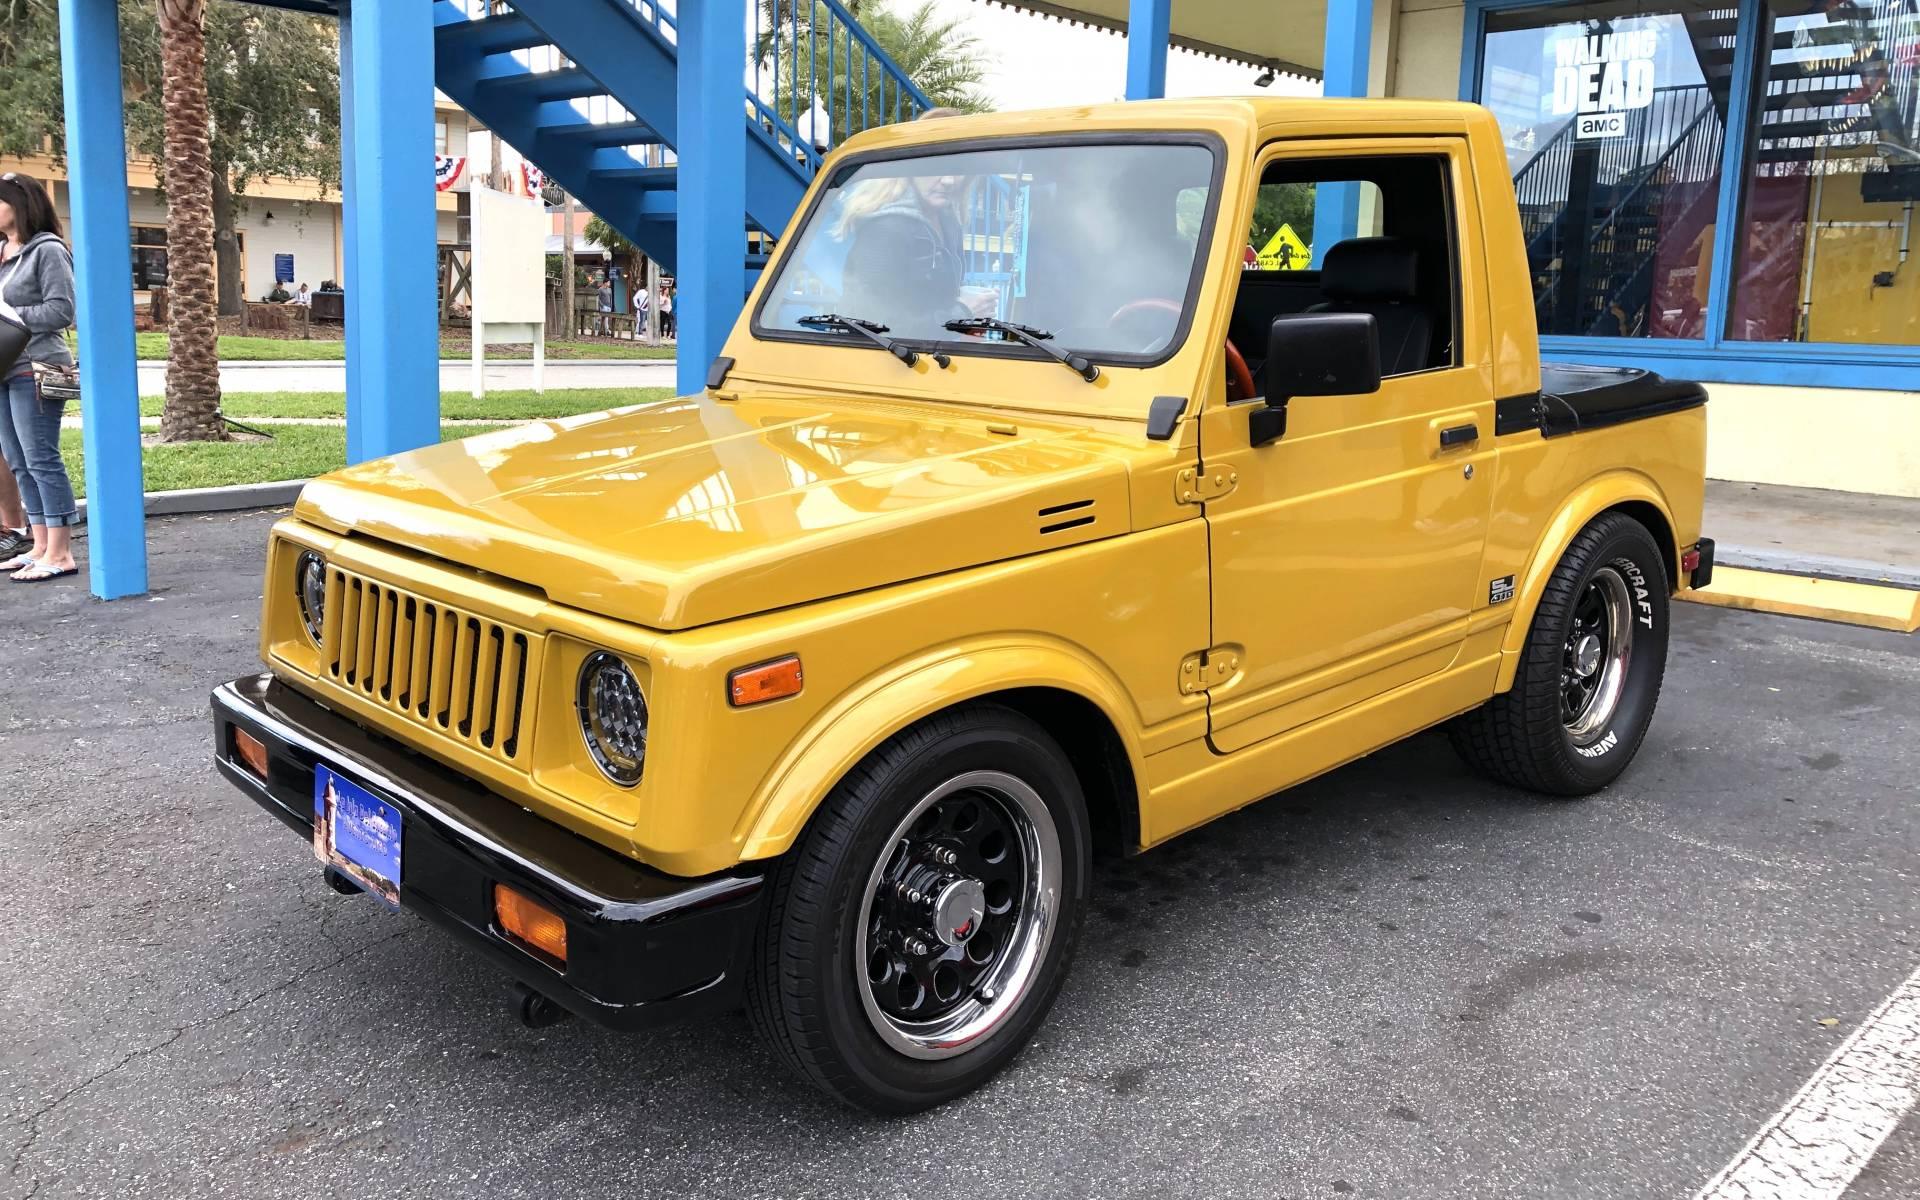 <p><strong>Suzuki SJ 410</strong></p>